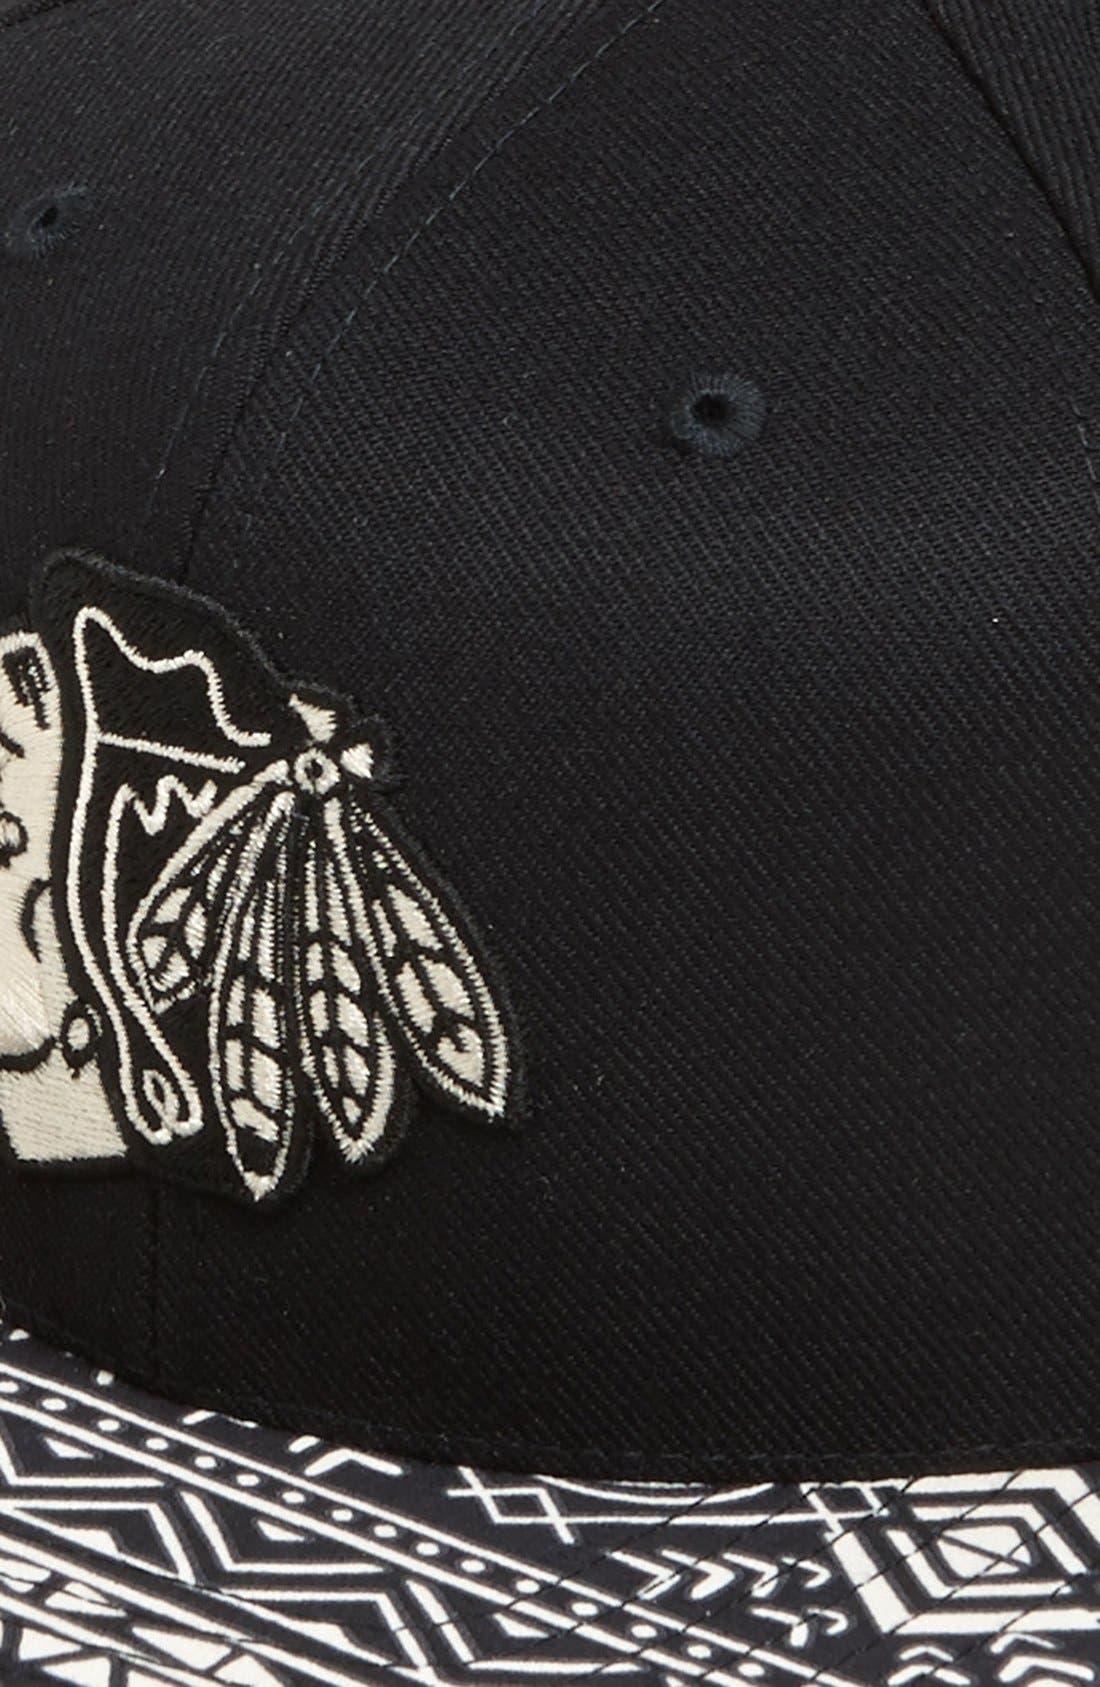 Alternate Image 2  - American Needle 'Chicago Blackhawks - Ancestor' Cap